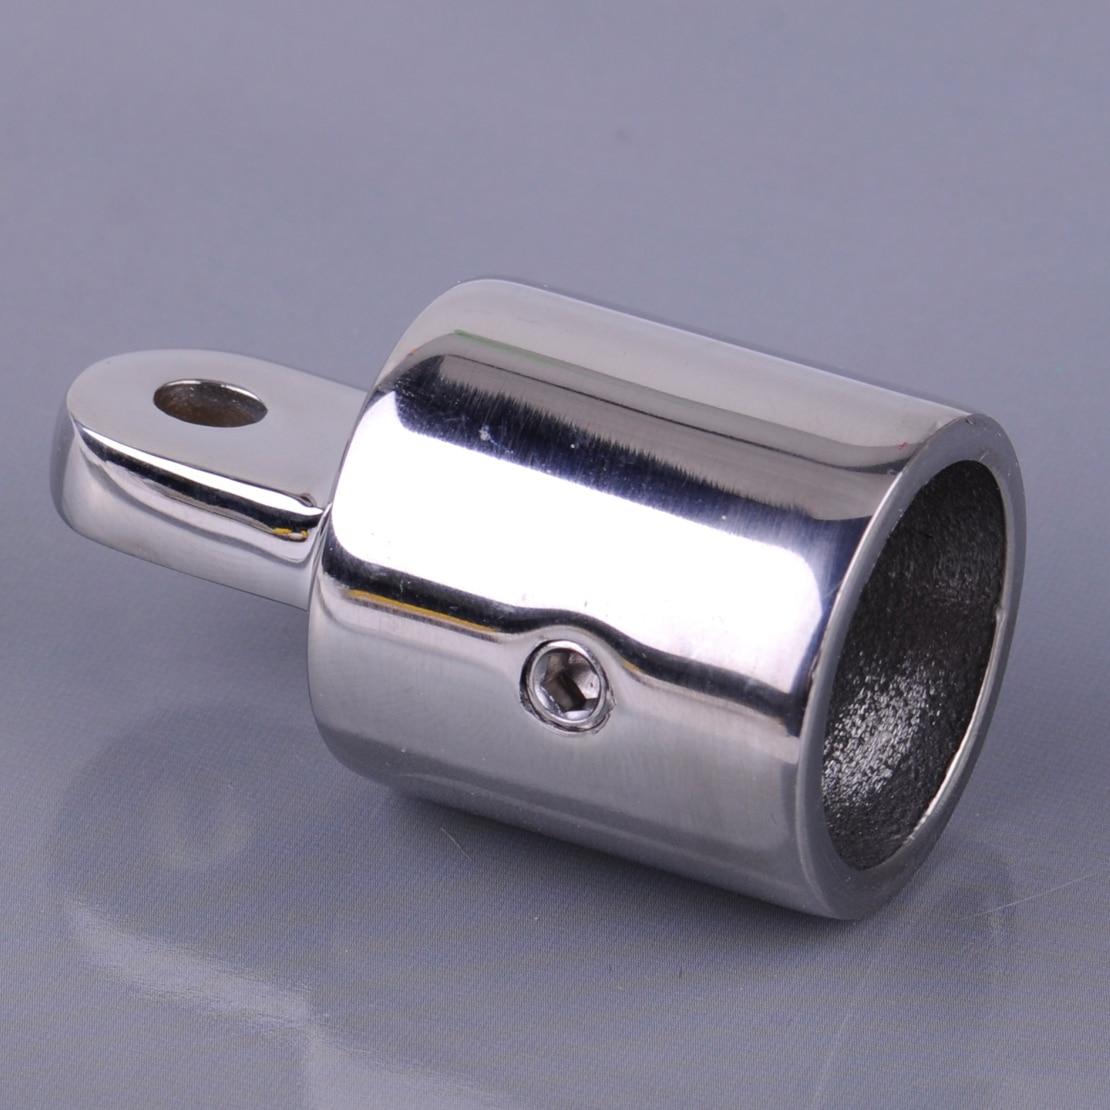 7//8/'/' Eye End Cap Bimini Top External Fitting Stainless Steel Marine Hardware